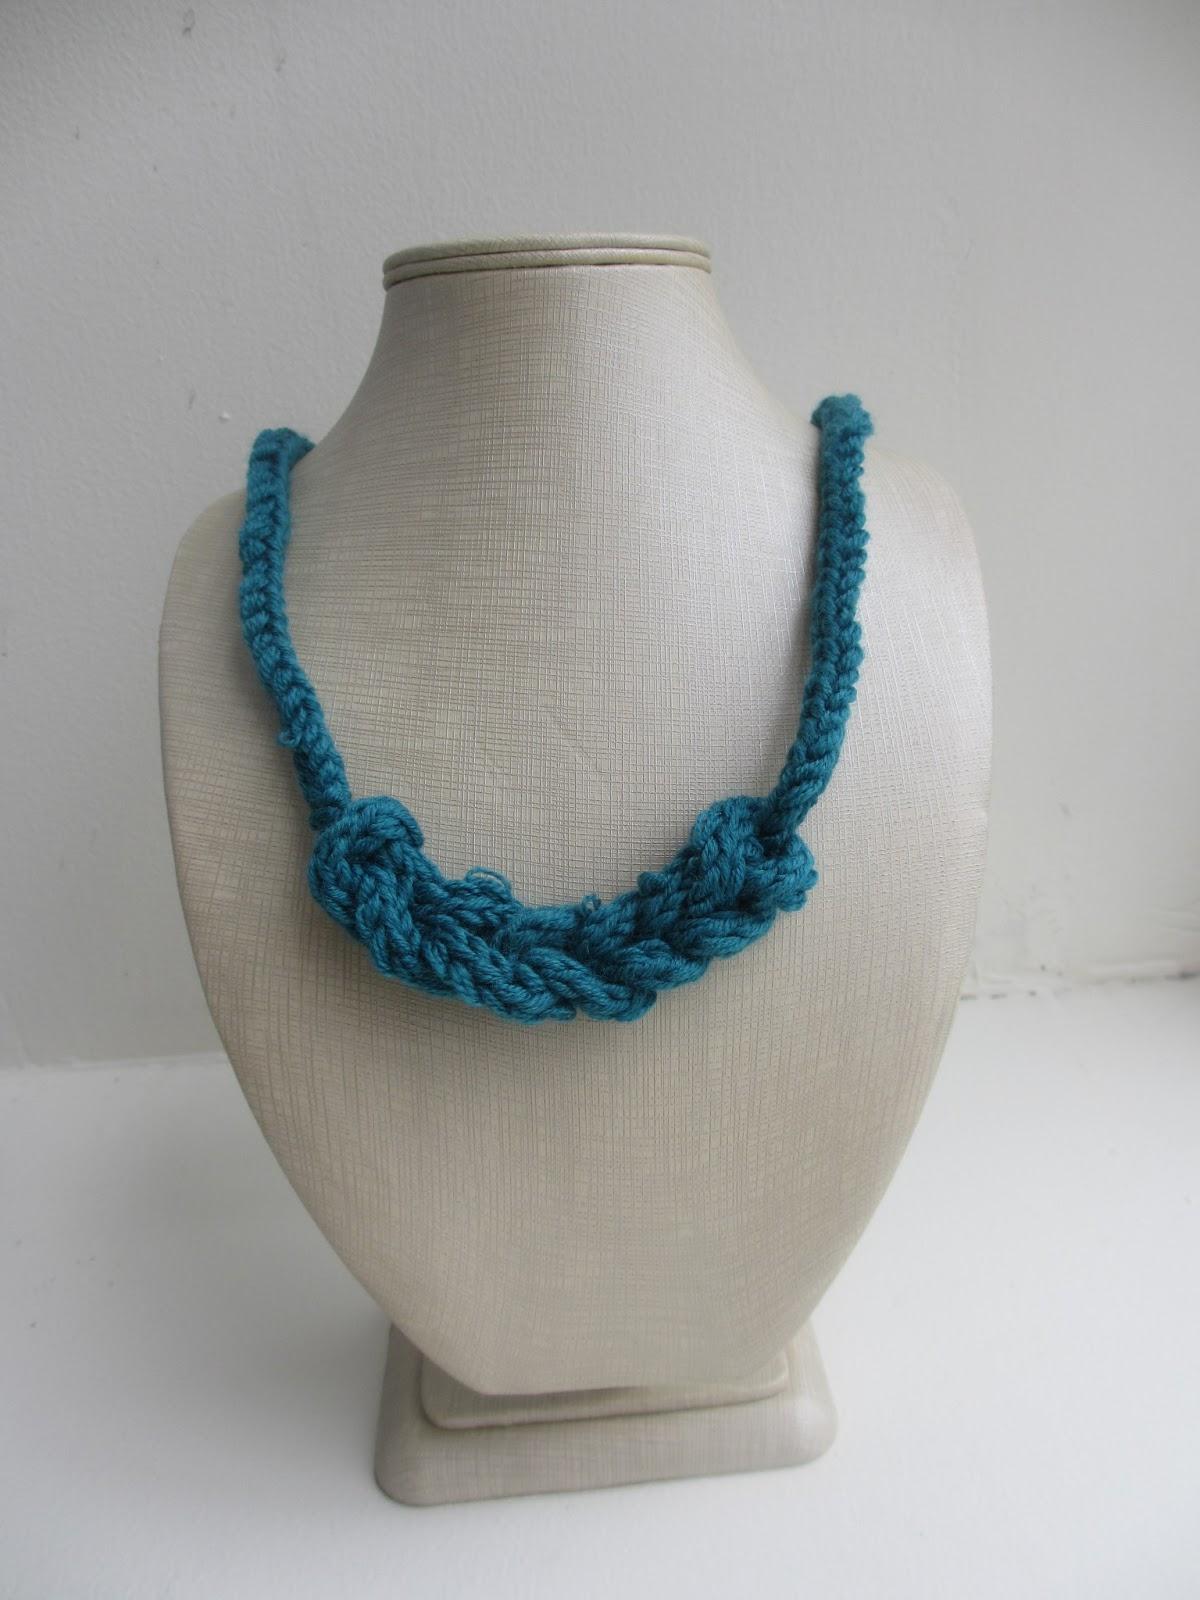 Crochet chain i-cord necklace